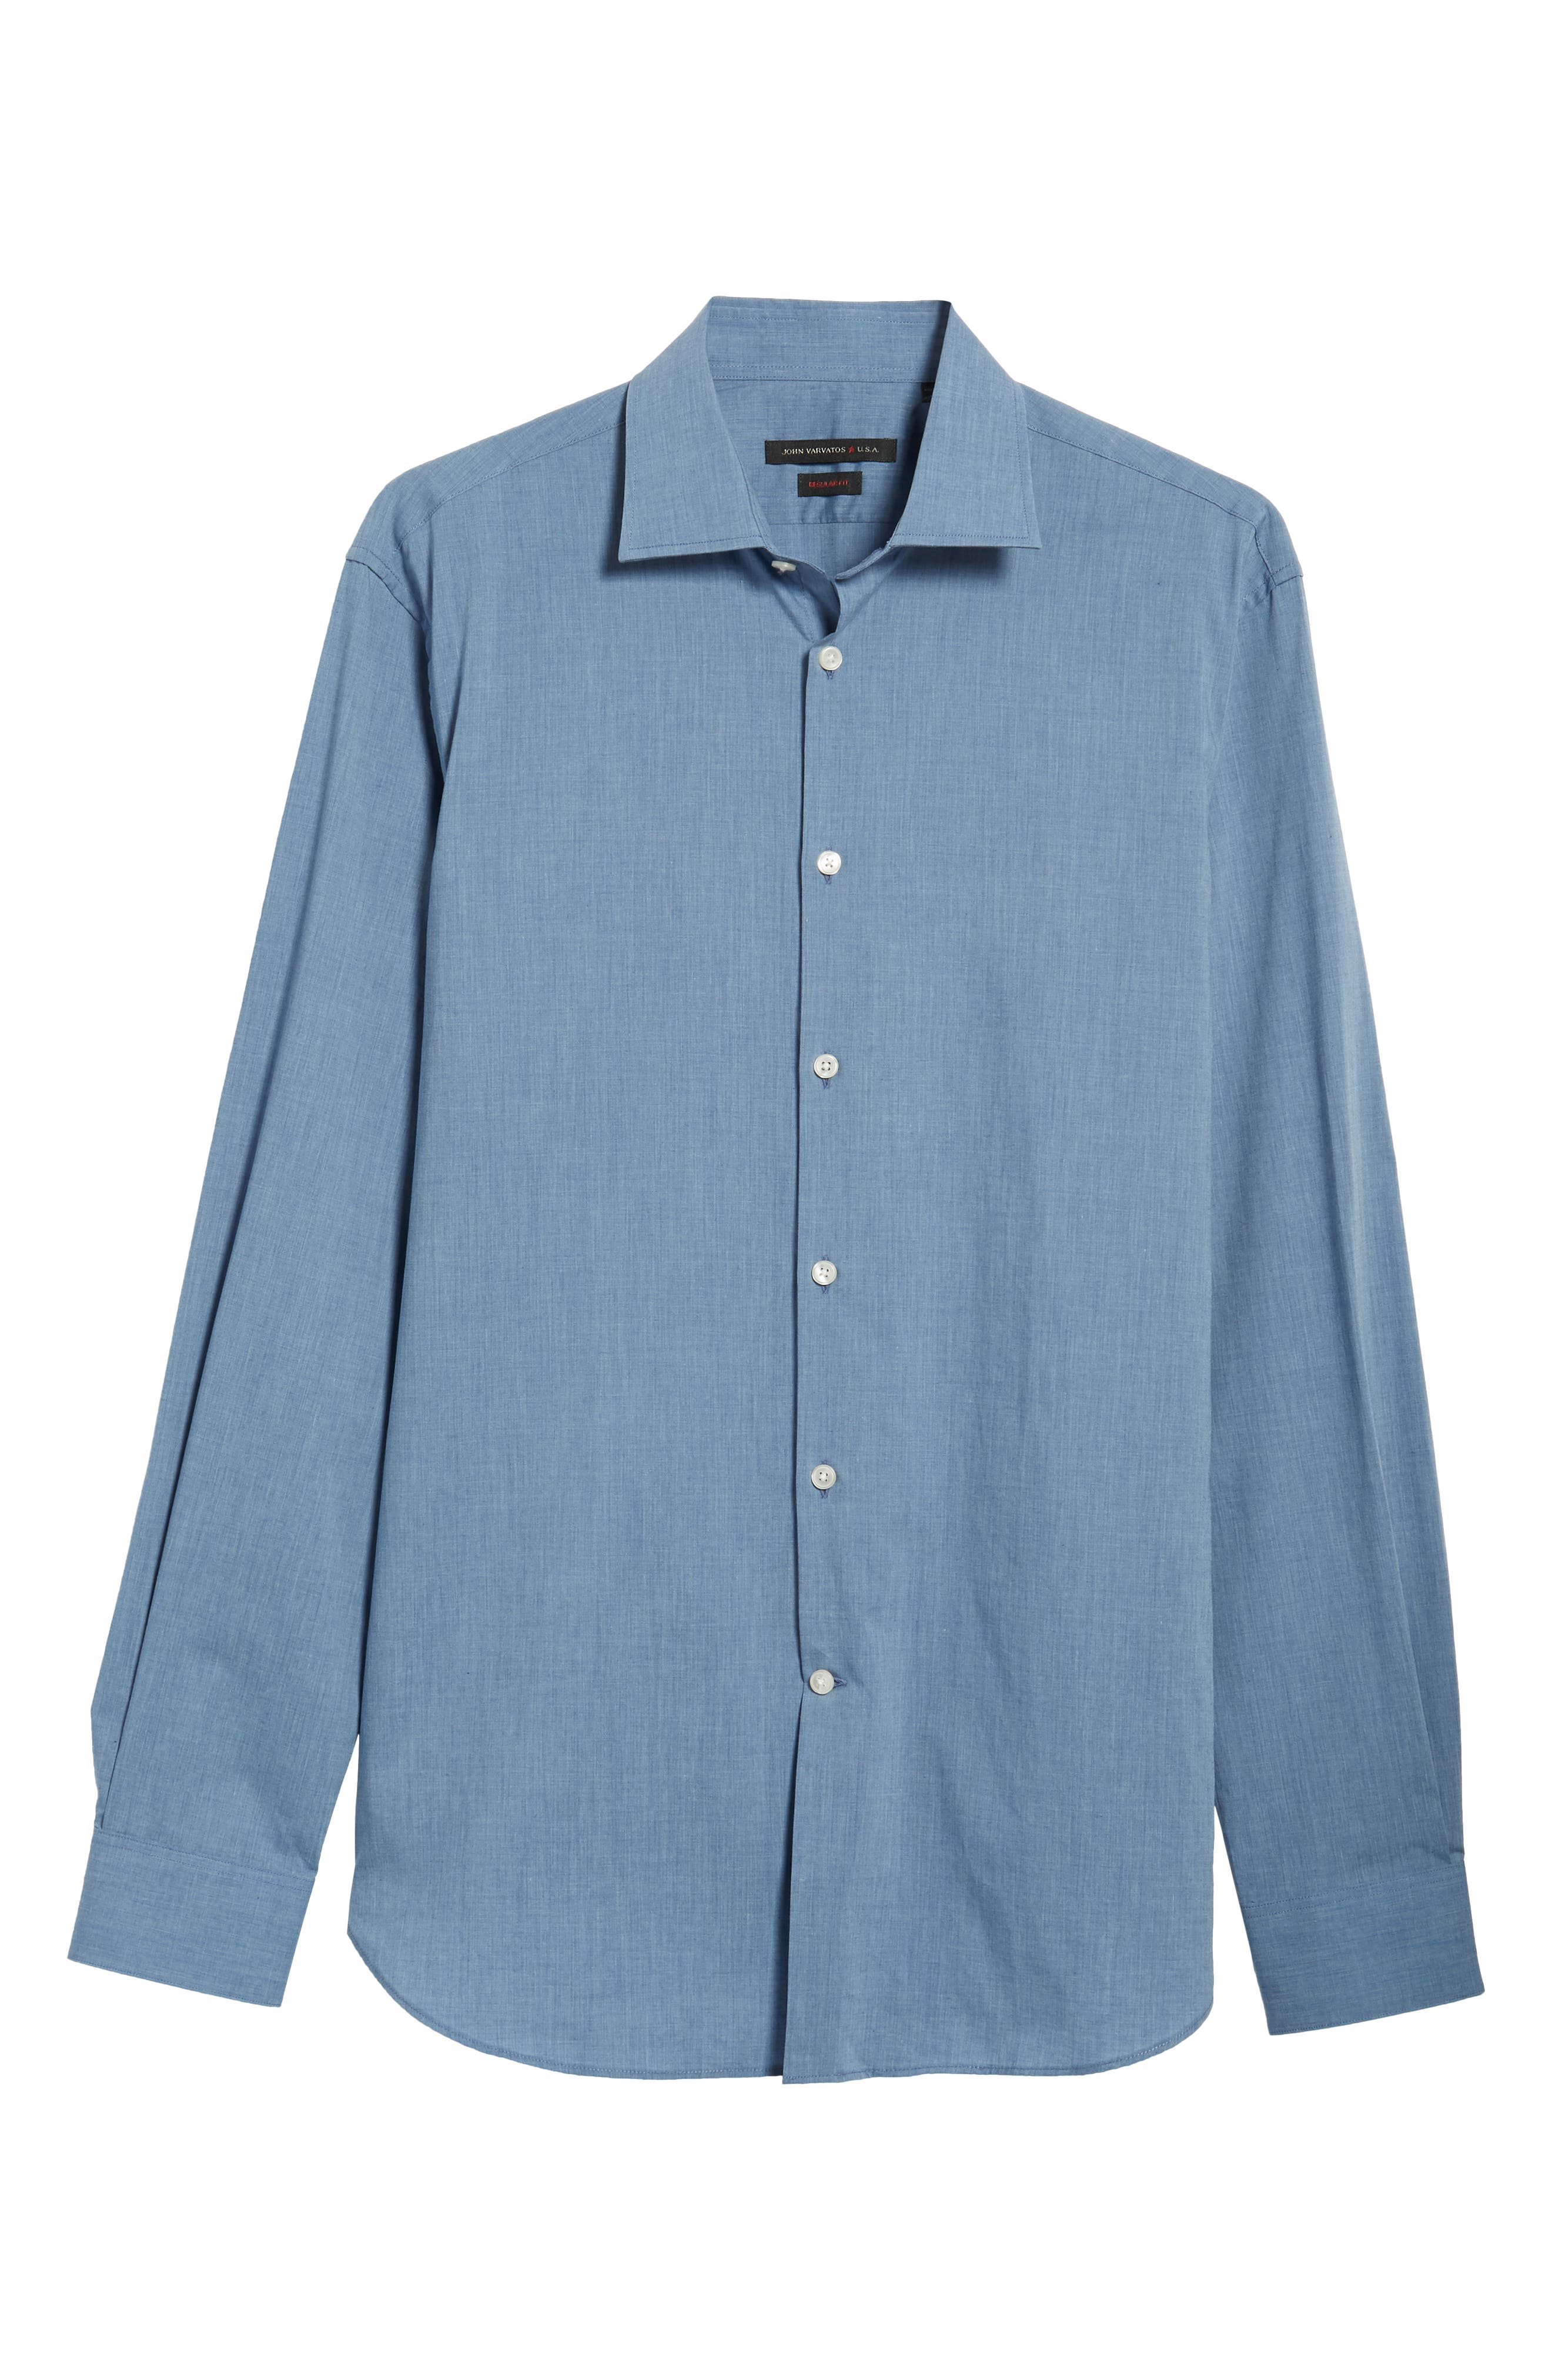 Regular Fit Solid Dress Shirt,                             Alternate thumbnail 5, color,                             BLUE HEATHER